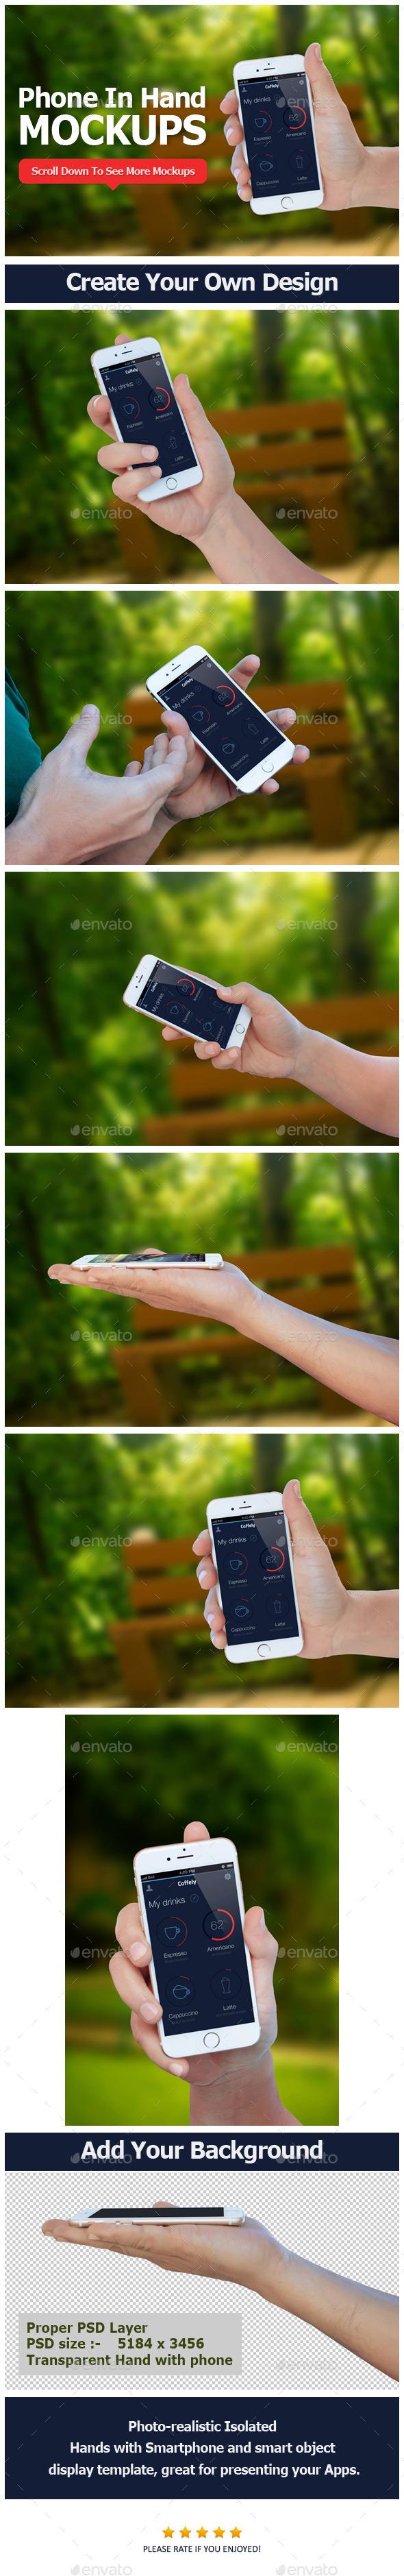 GraphicRiver Smartphone in Hand Mockup 10802940